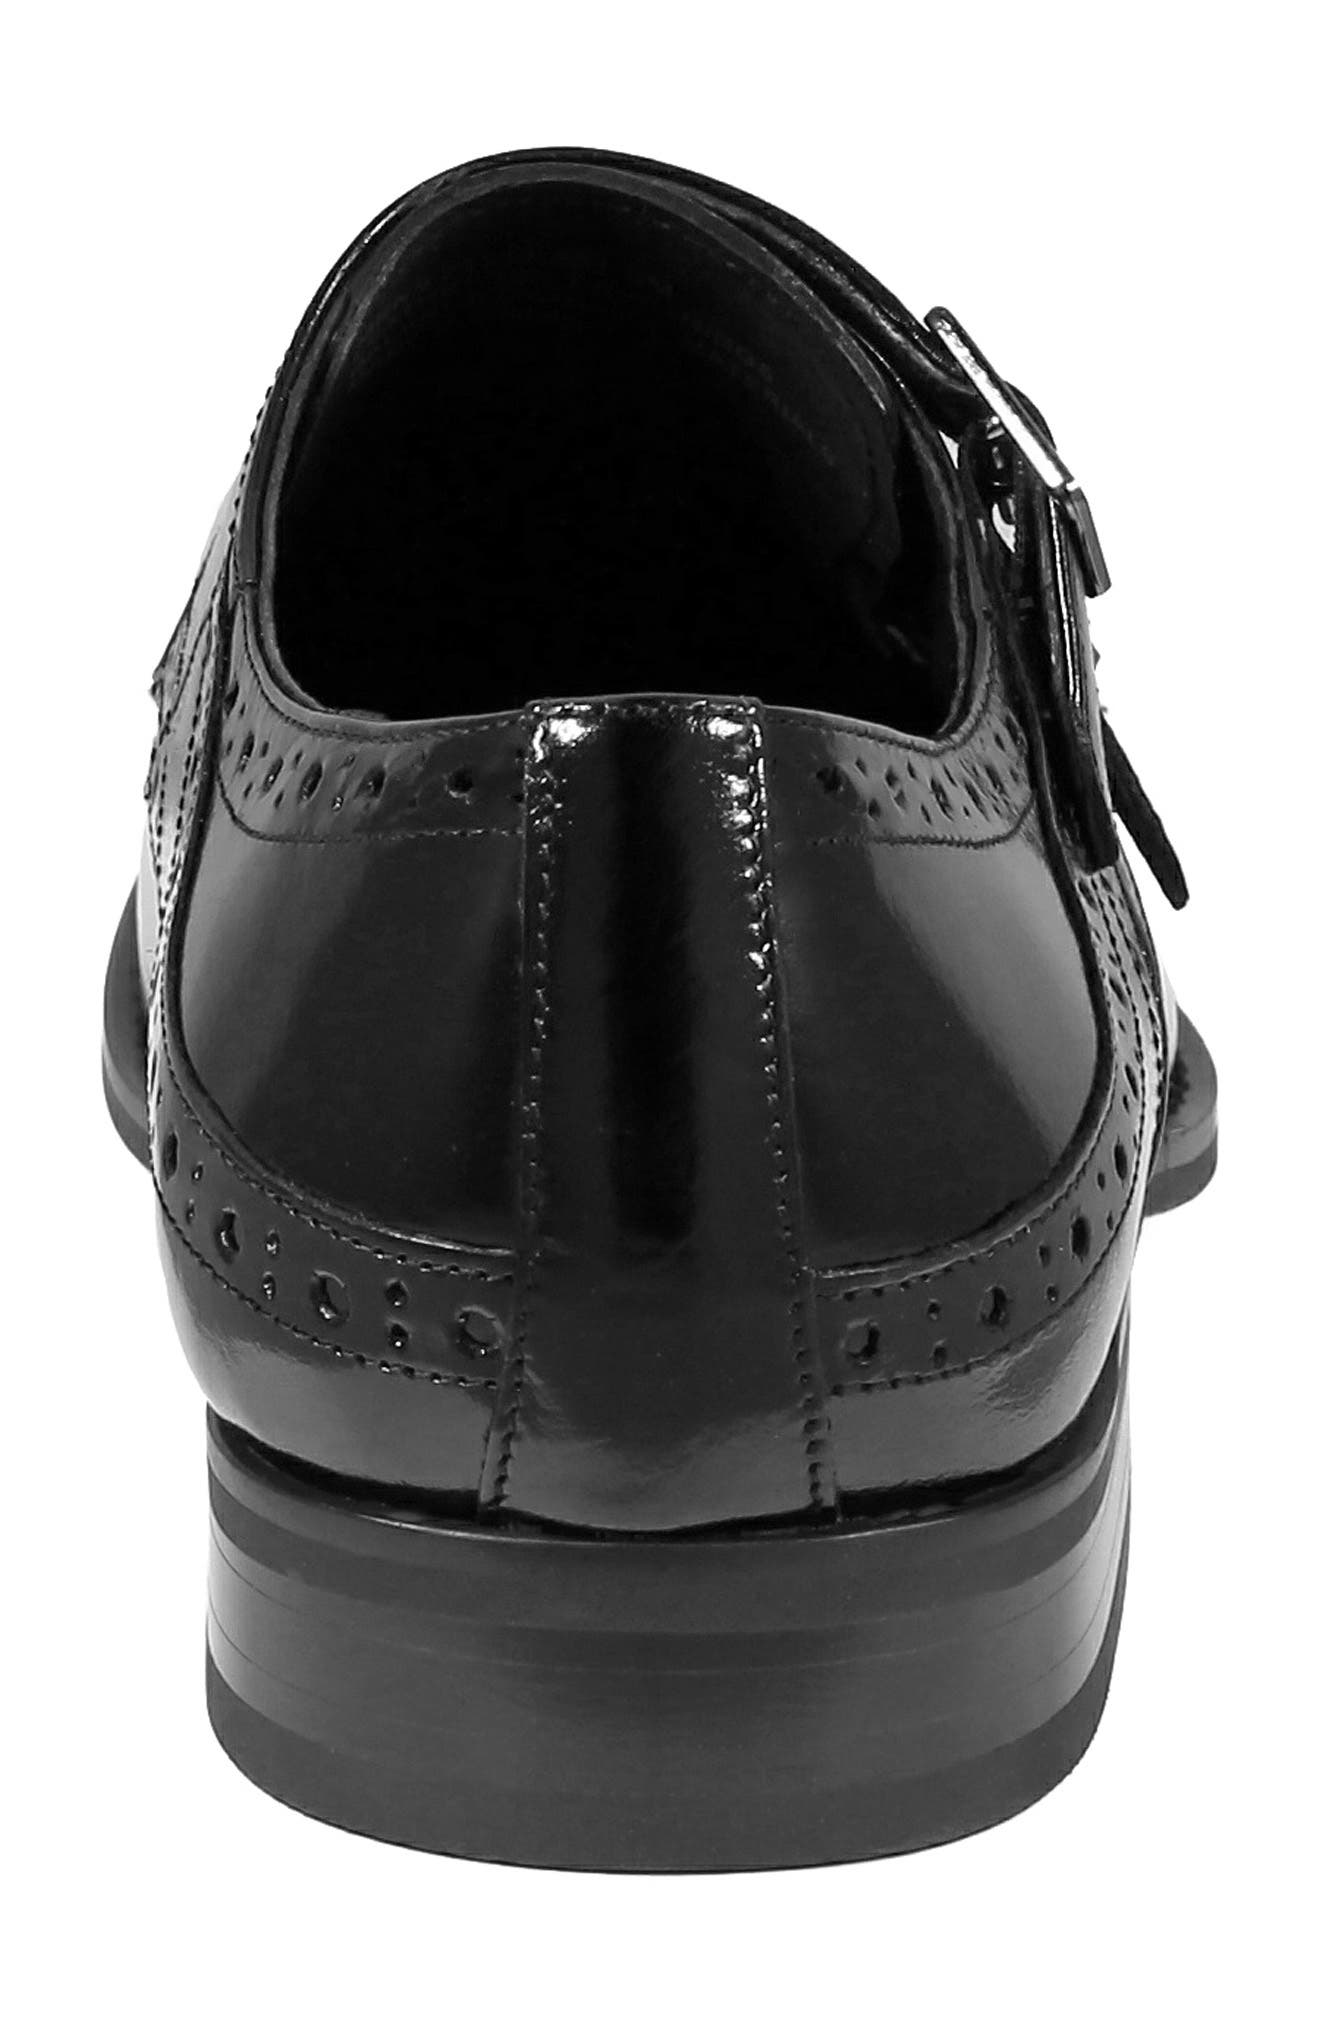 Tayton Cap Toe Double Strap Monk Shoe,                             Alternate thumbnail 8, color,                             001